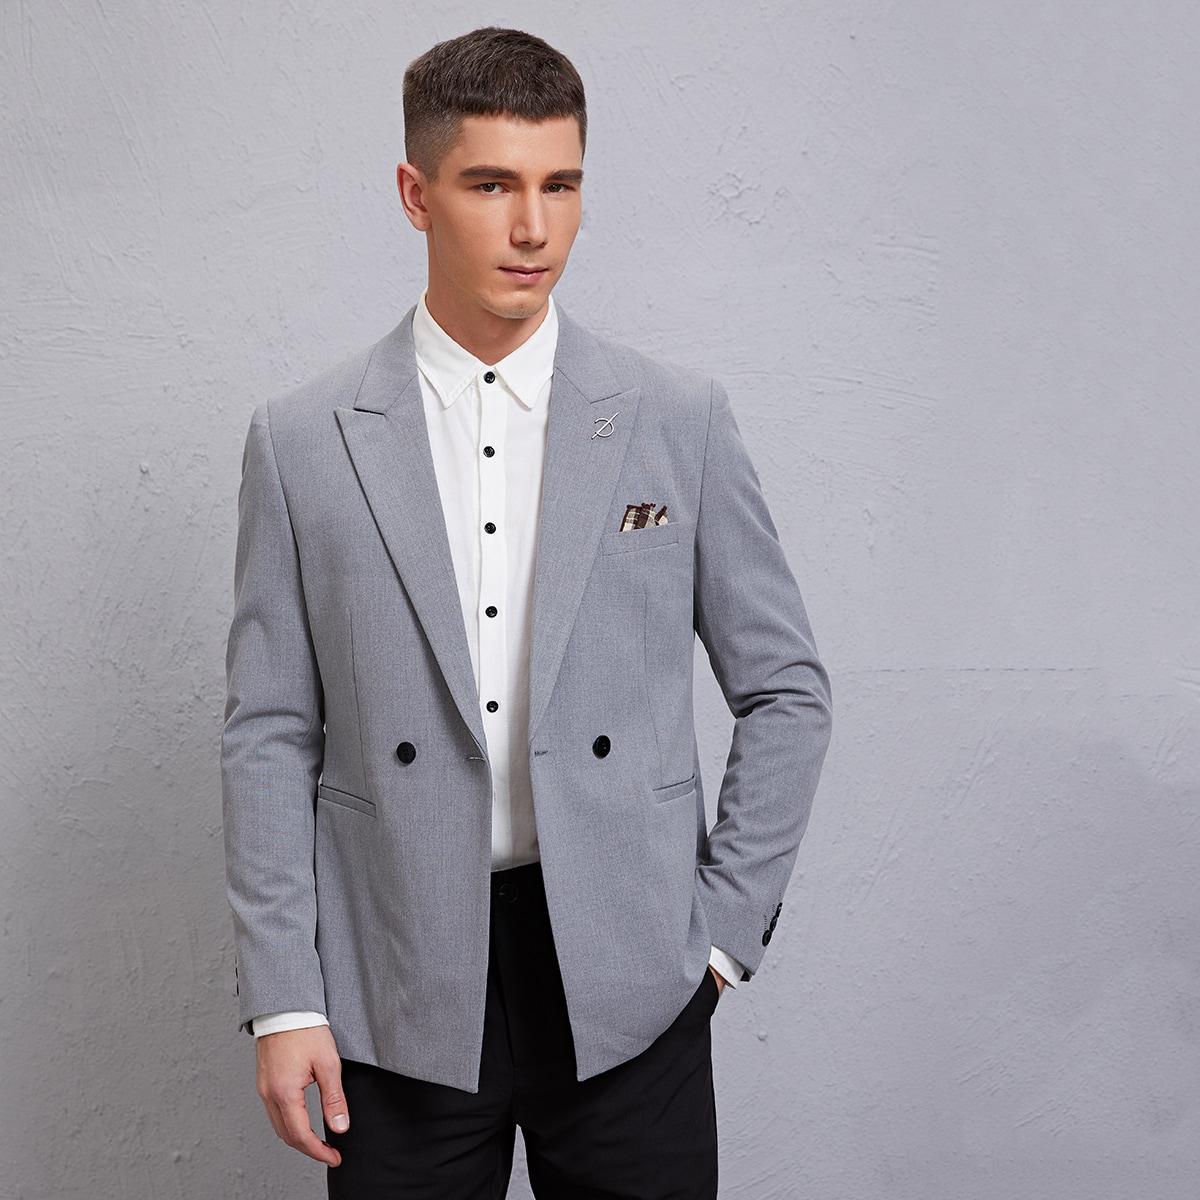 Men Lapel Neck Double Button Blazer, SHEIN  - buy with discount